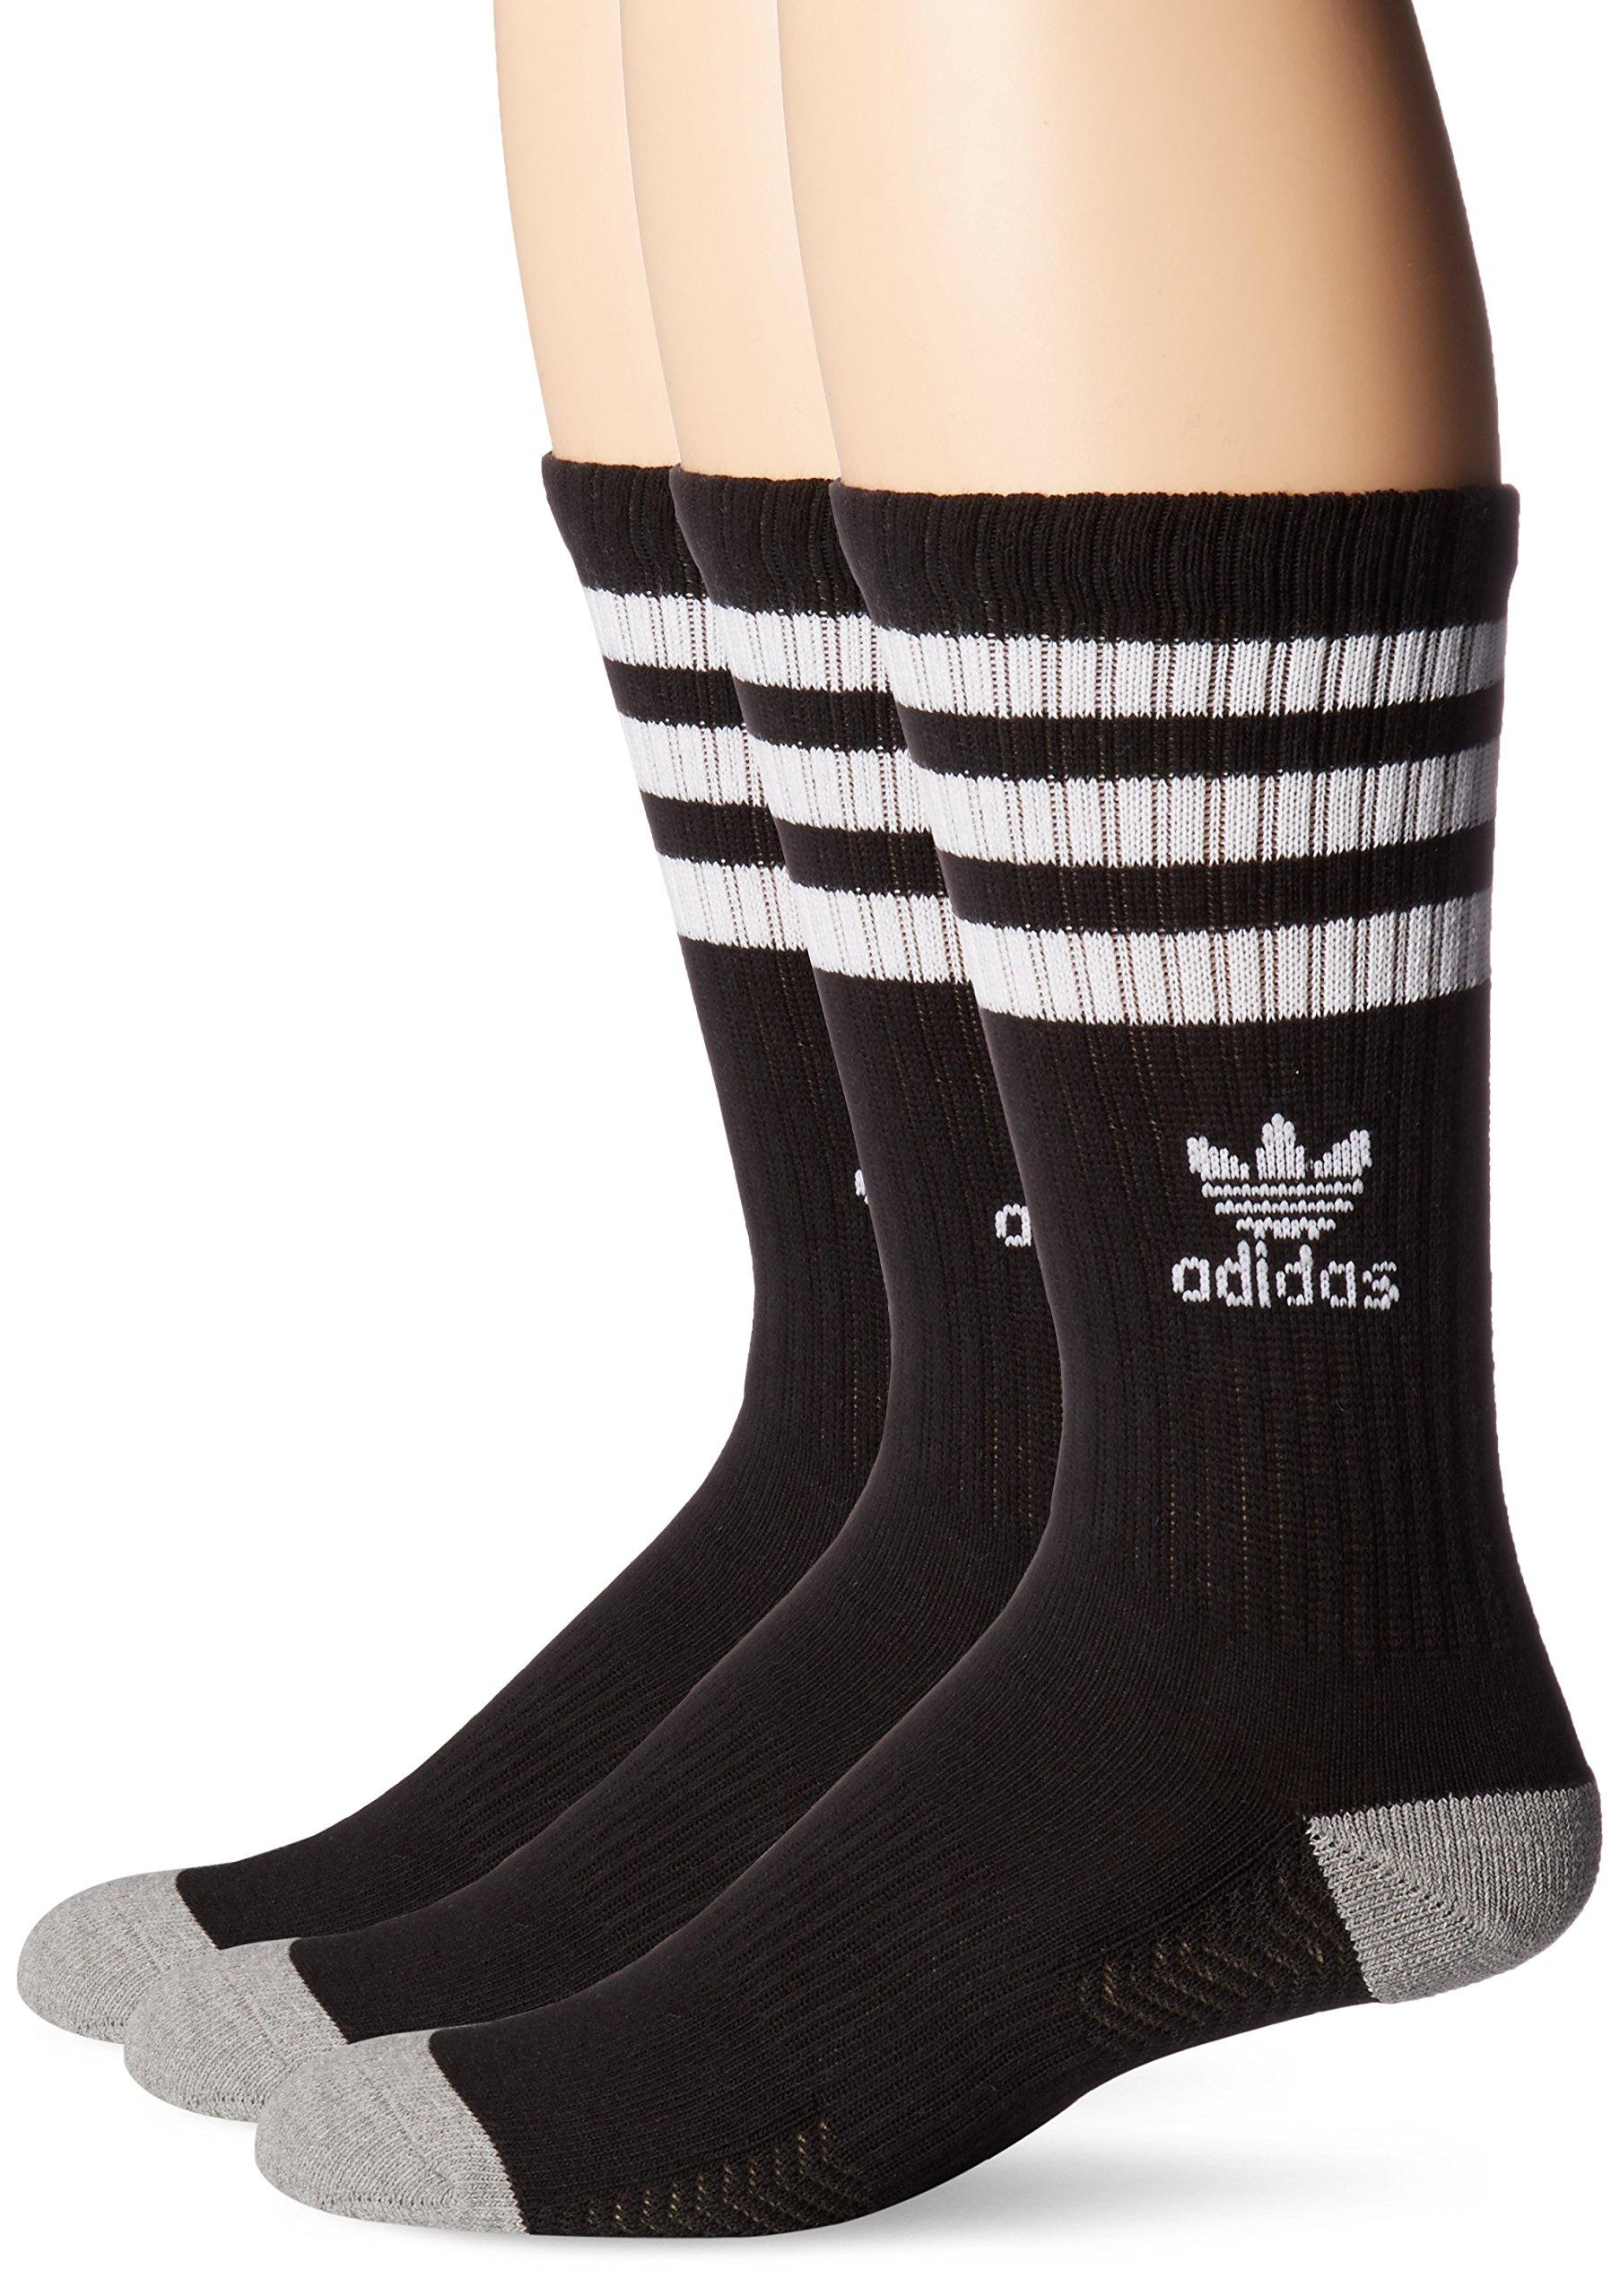 adidas Men's Originals Crew Socks (3-Pack), Black/White/Heather Grey, Large